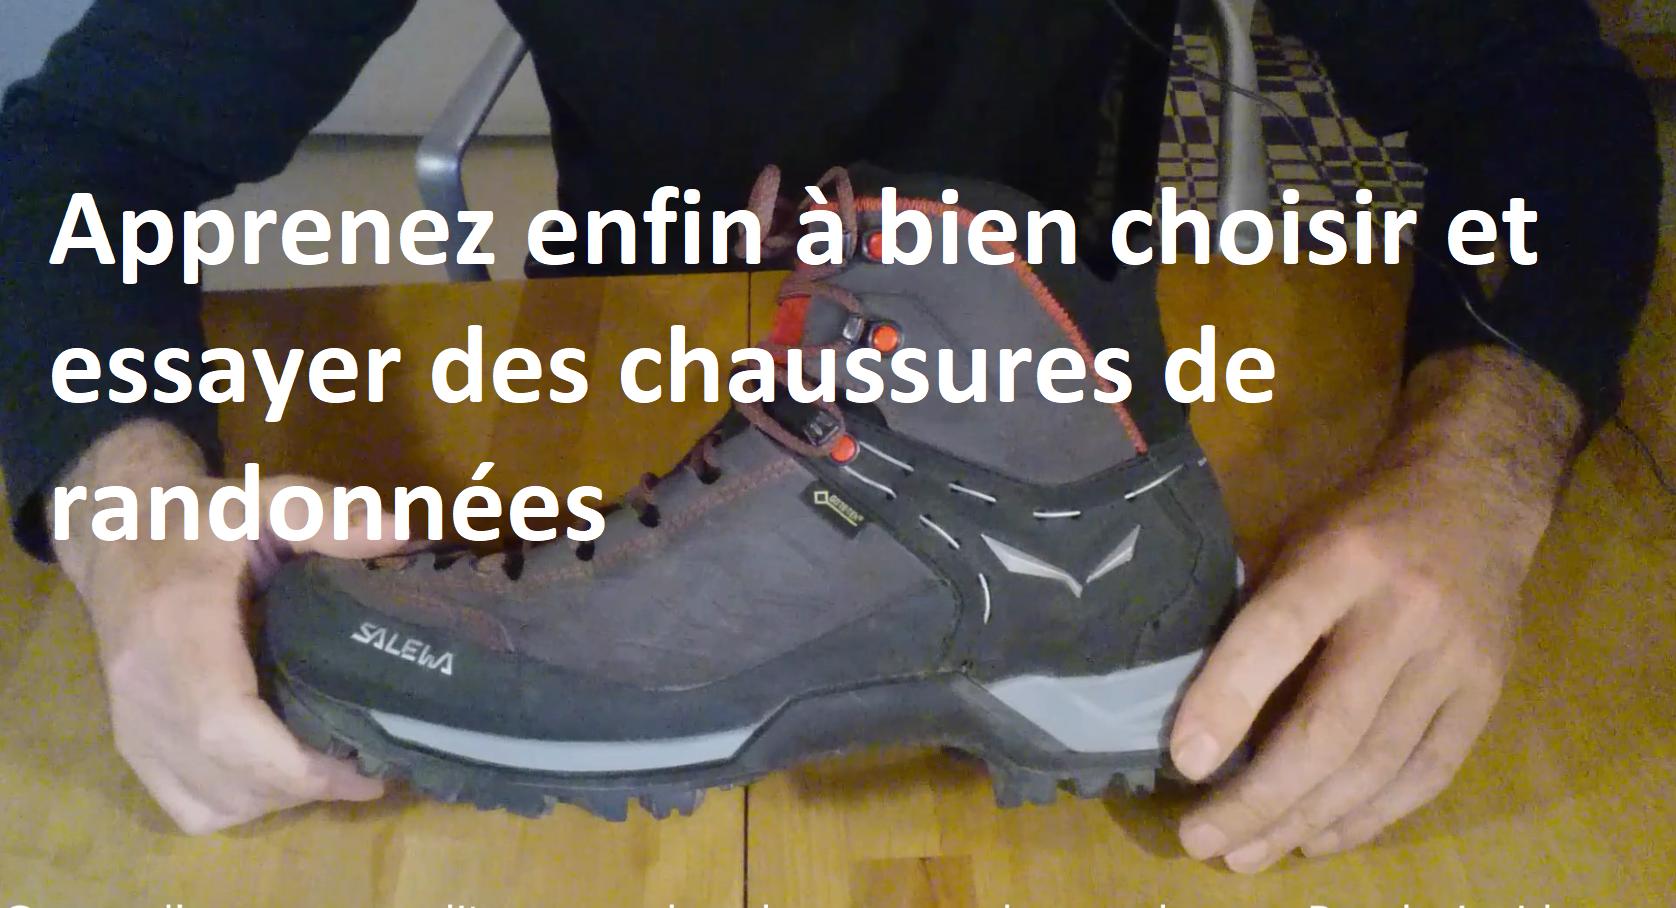 rando inside, randonnée, chaussures randonnée